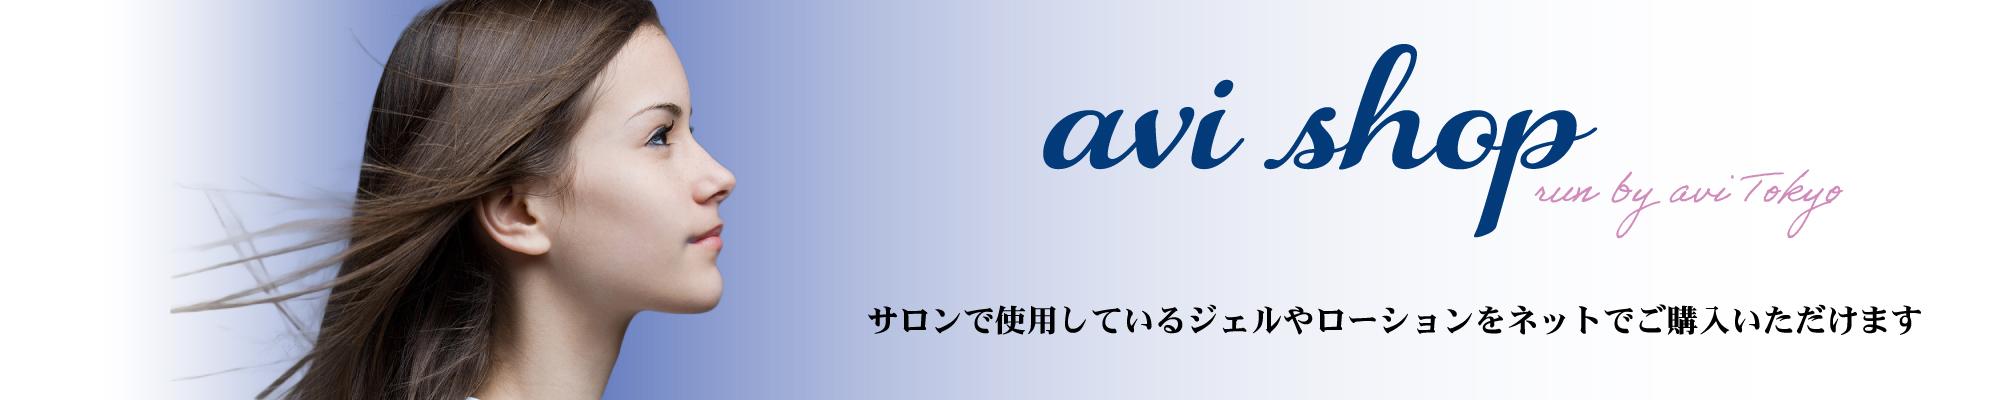 avi shop